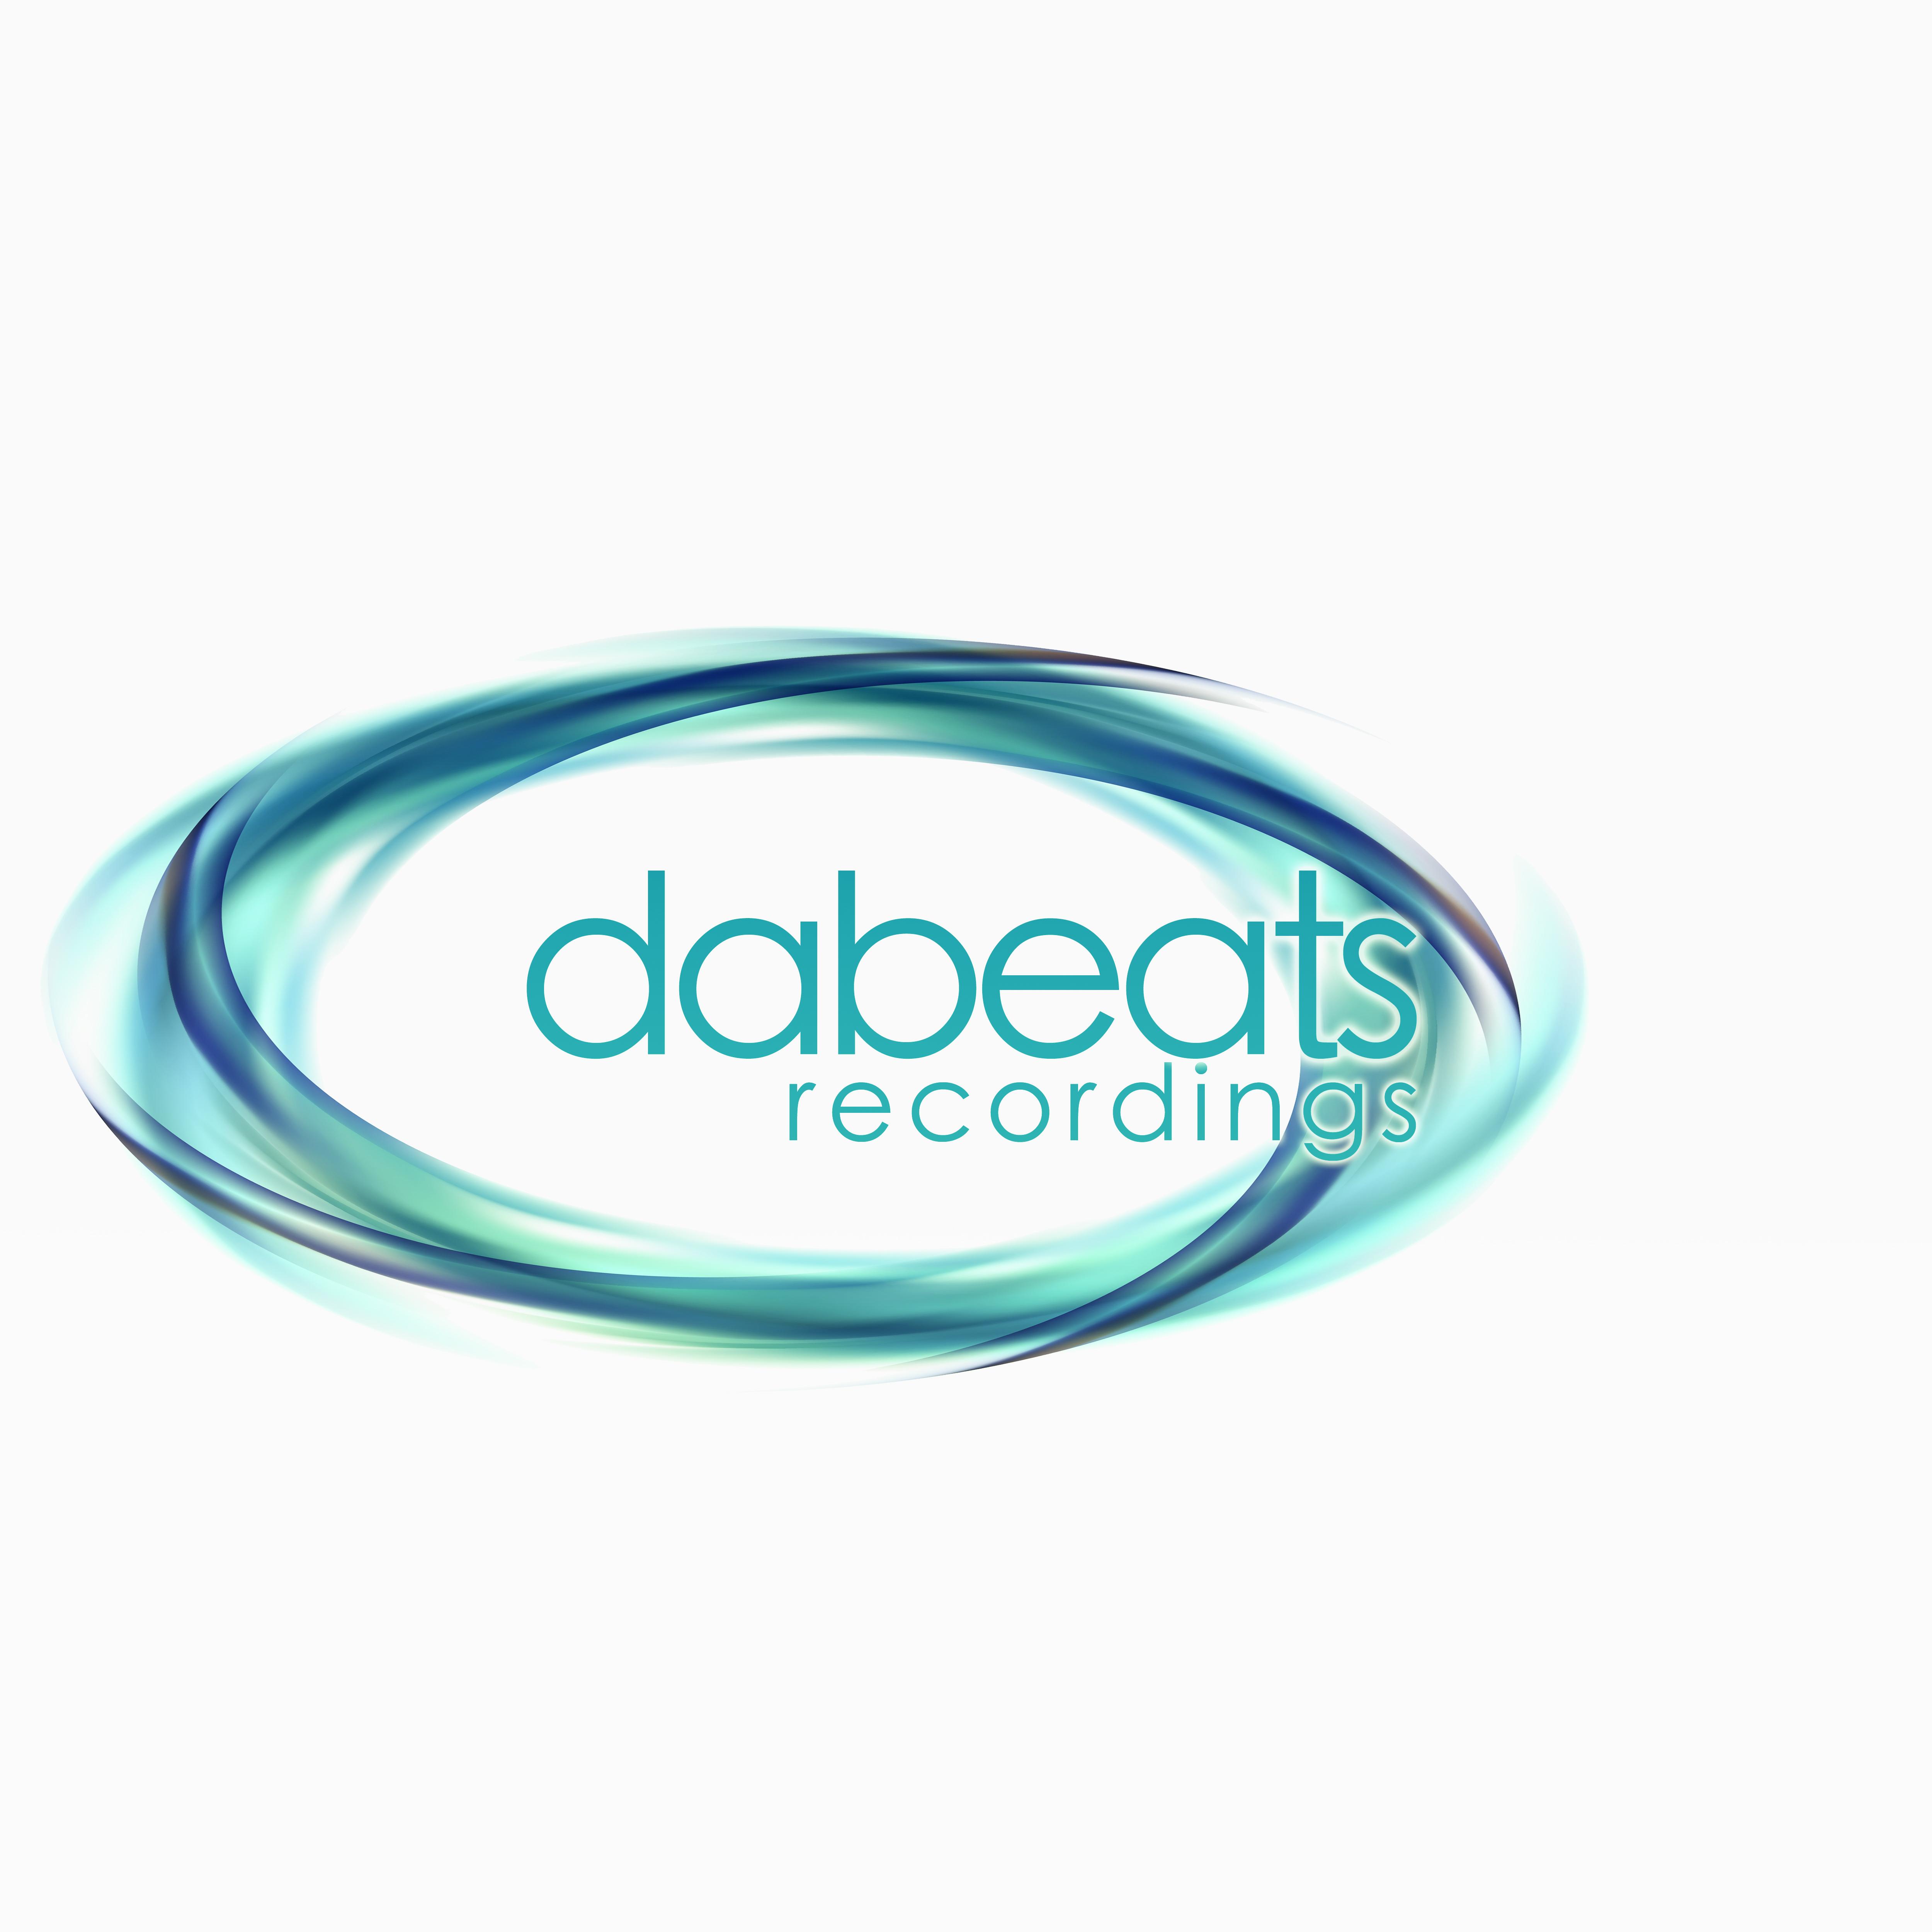 Dabeats Recordings